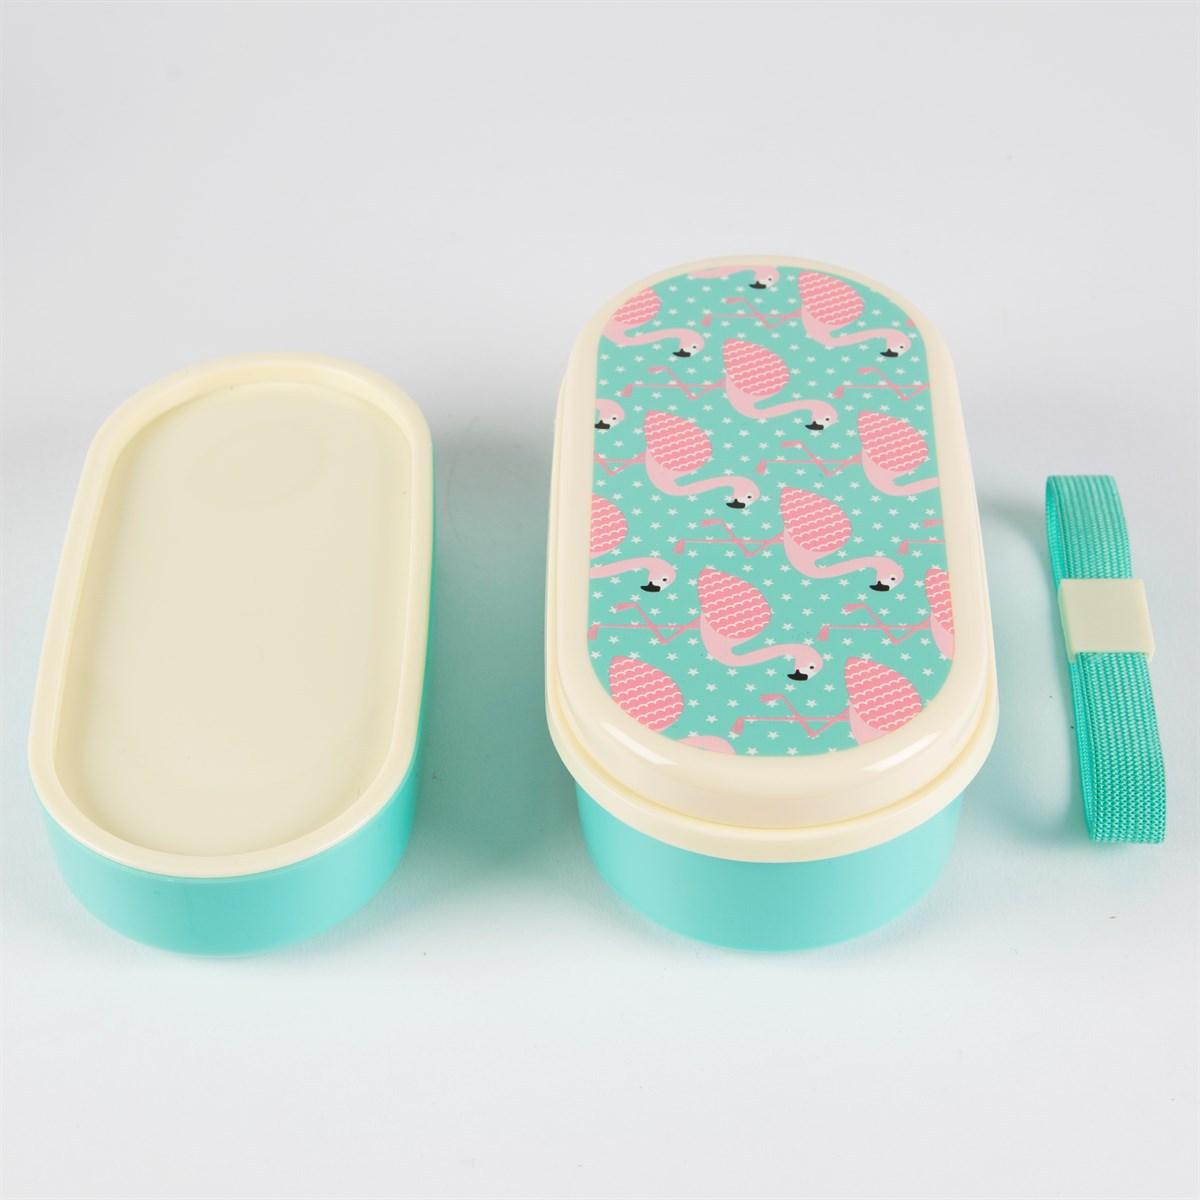 bento lunch box flamand rose maxi006 achat vente vaisselle couvert sur. Black Bedroom Furniture Sets. Home Design Ideas